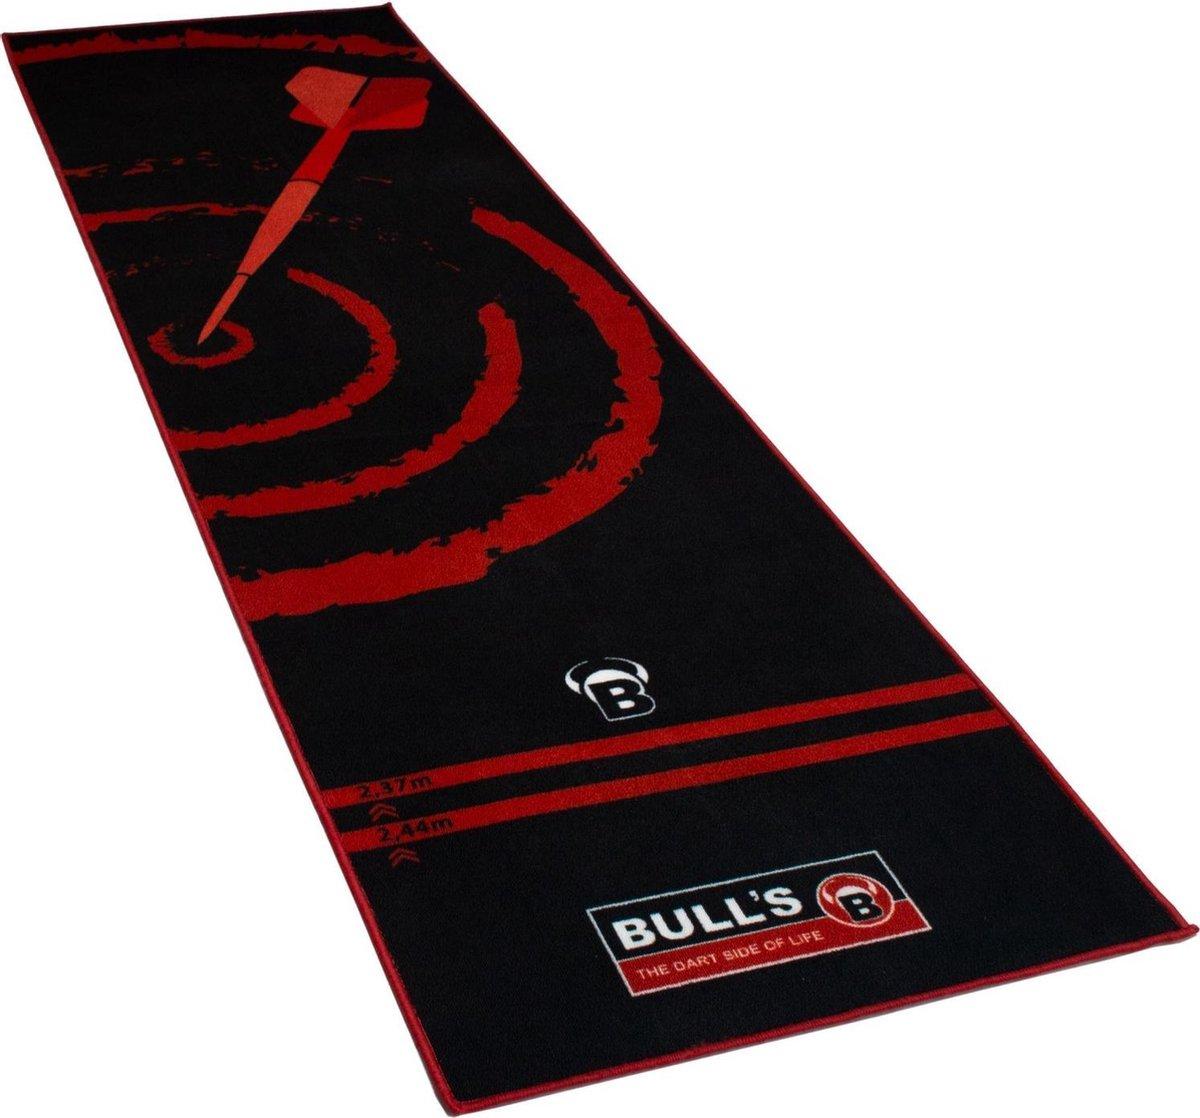 Bull's Dartmat 280 x 80cm Rood